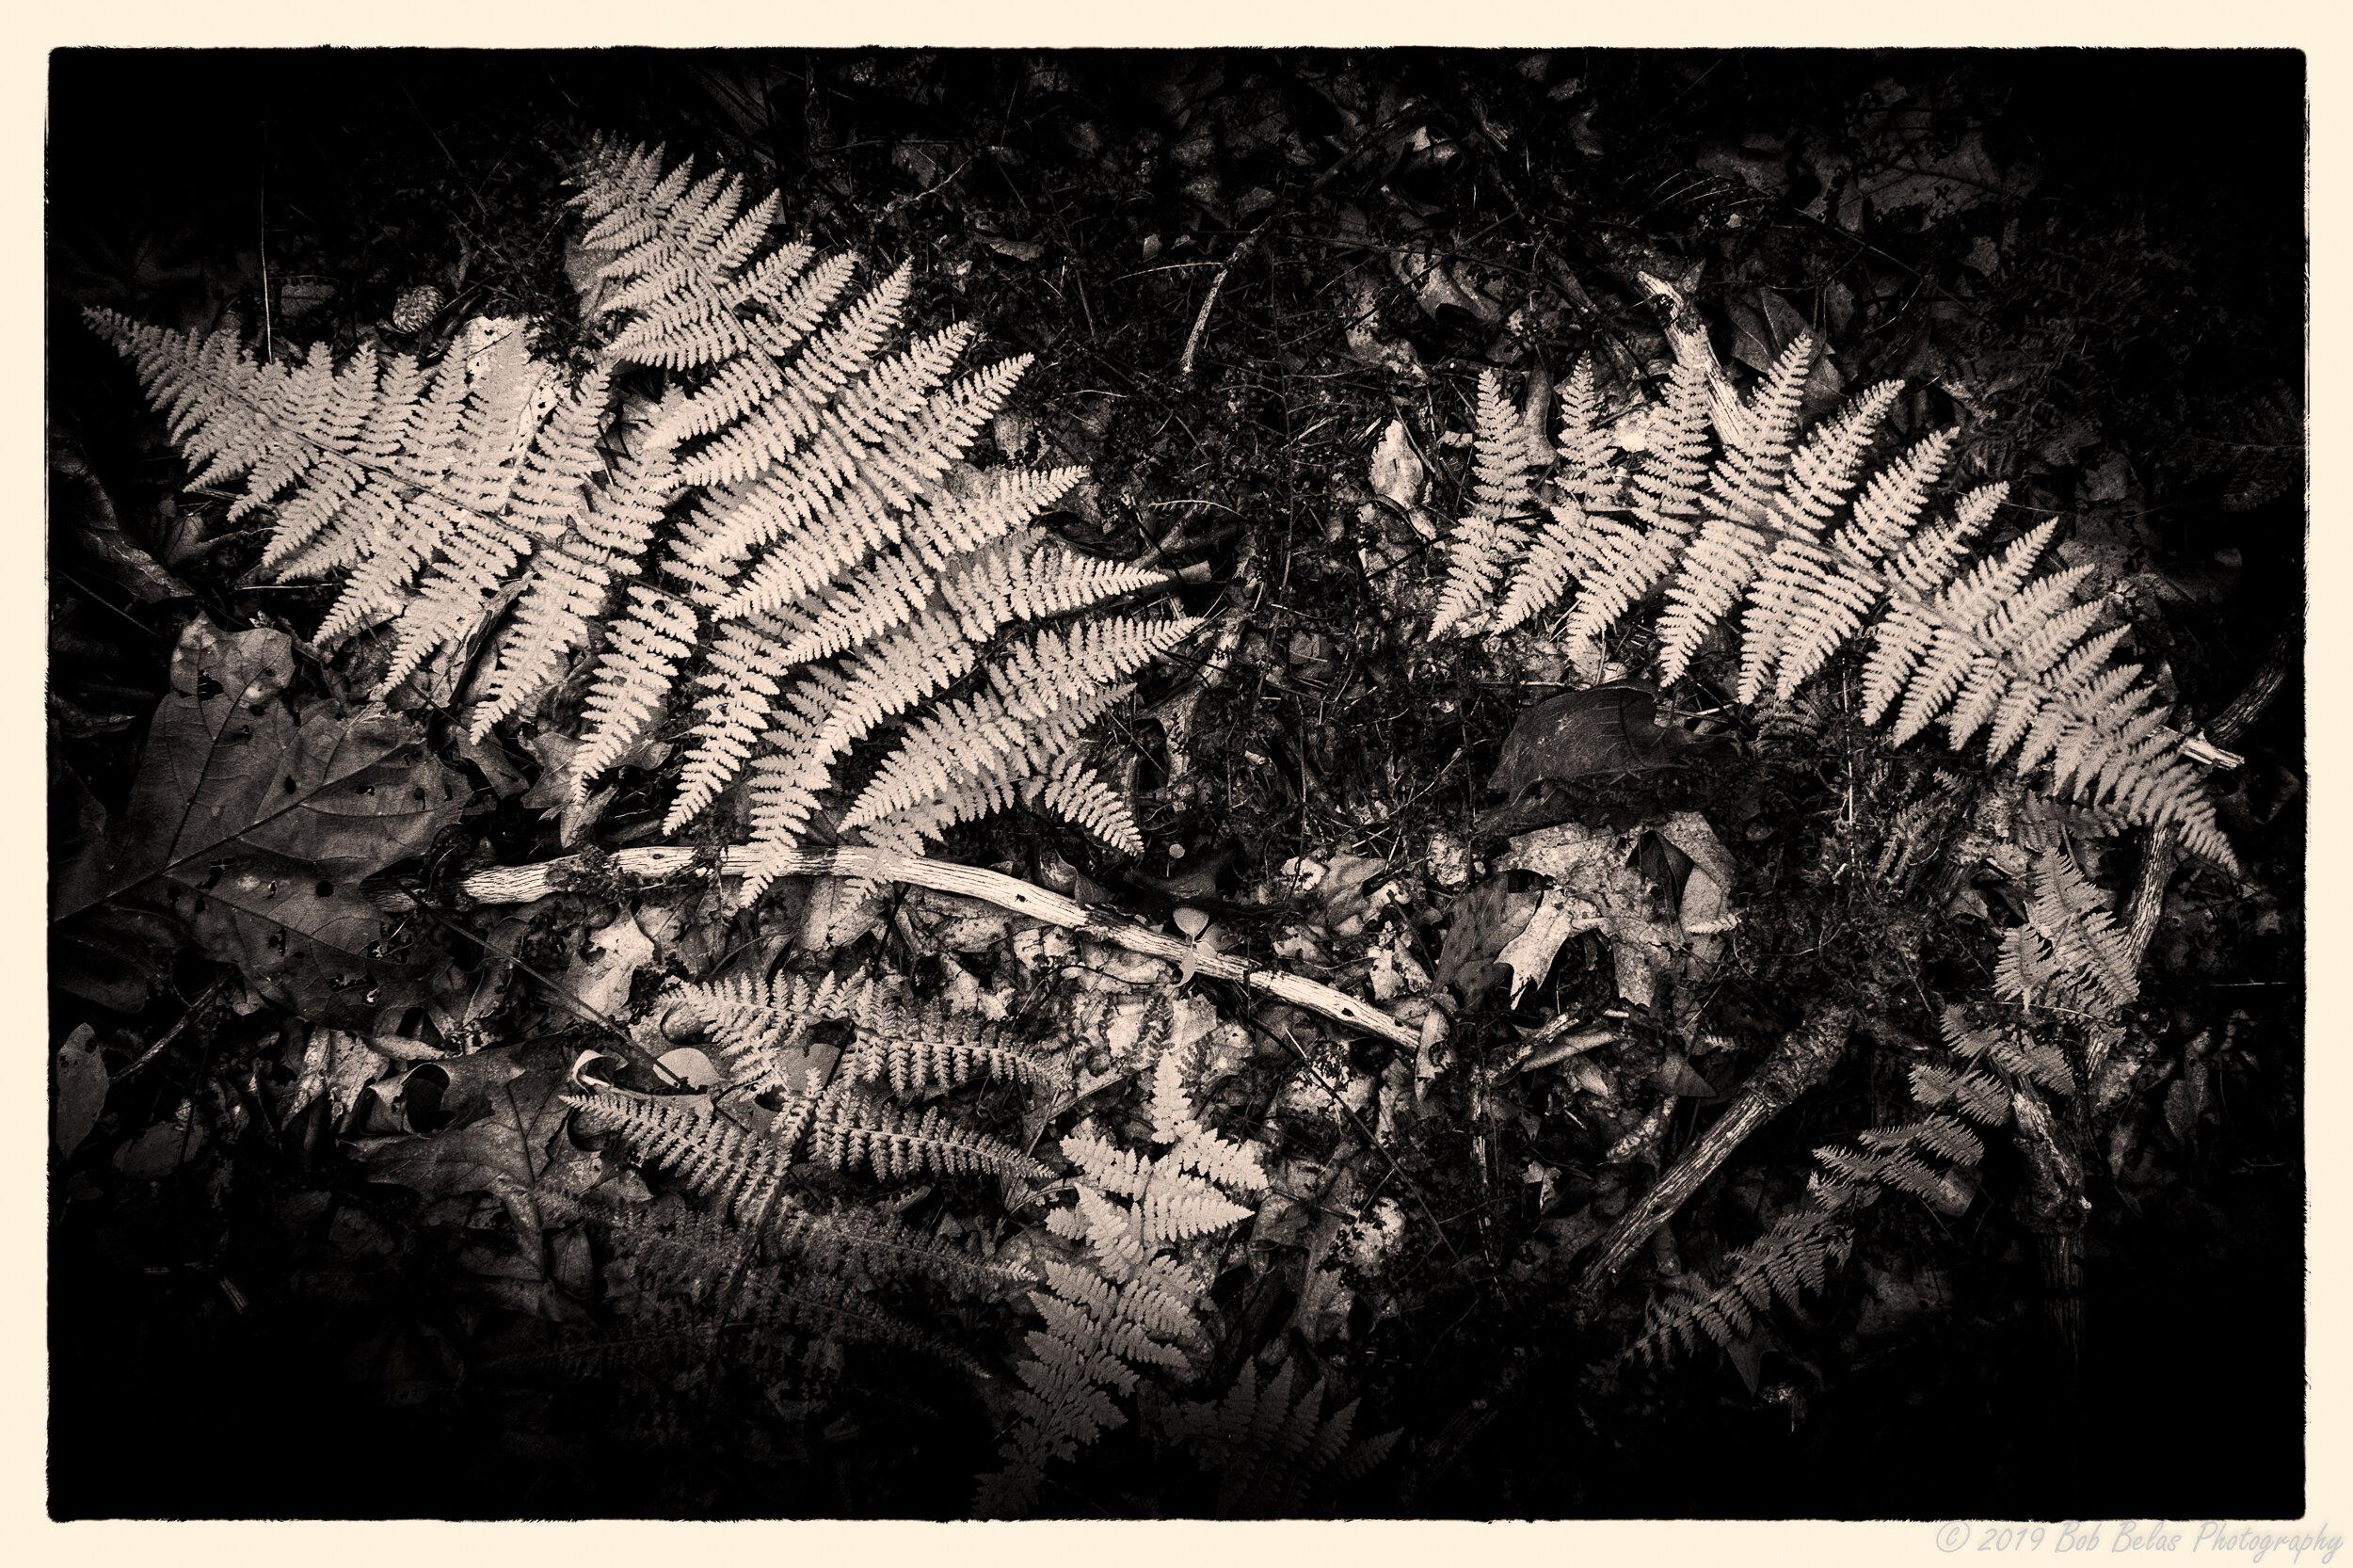 Ferns at dusk 3, monochrome